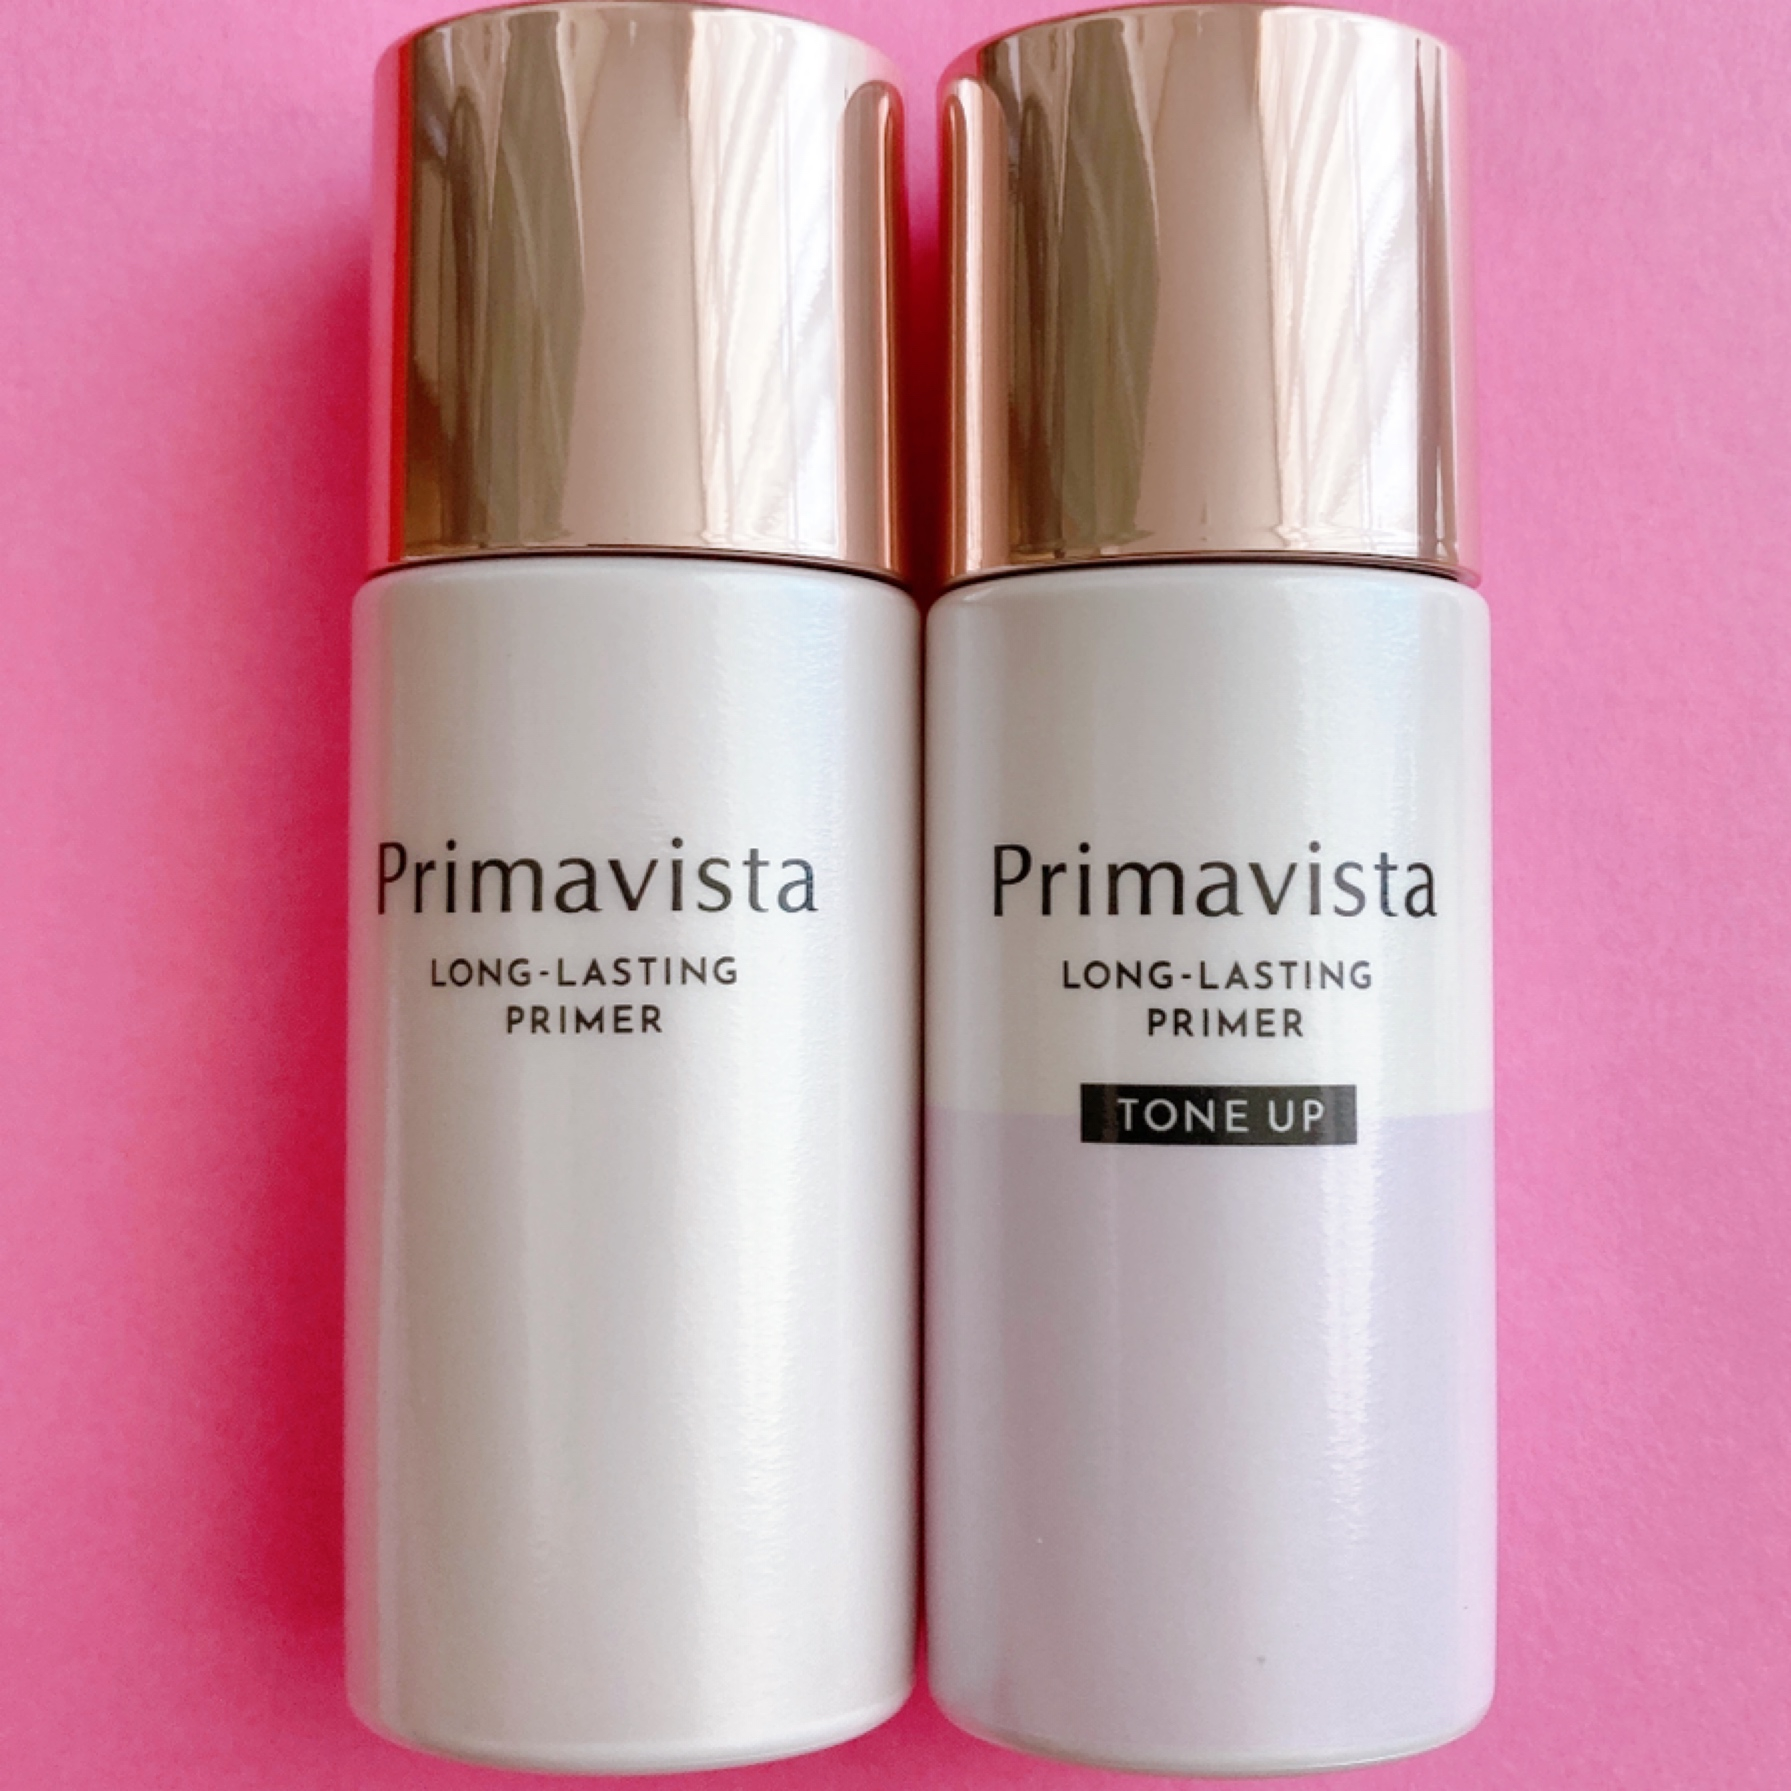 SOFINA Primavista(ソフィーナ プリマヴィスタ)皮脂くずれ防止 化粧下地を使ったyunaさんのクチコミ画像4